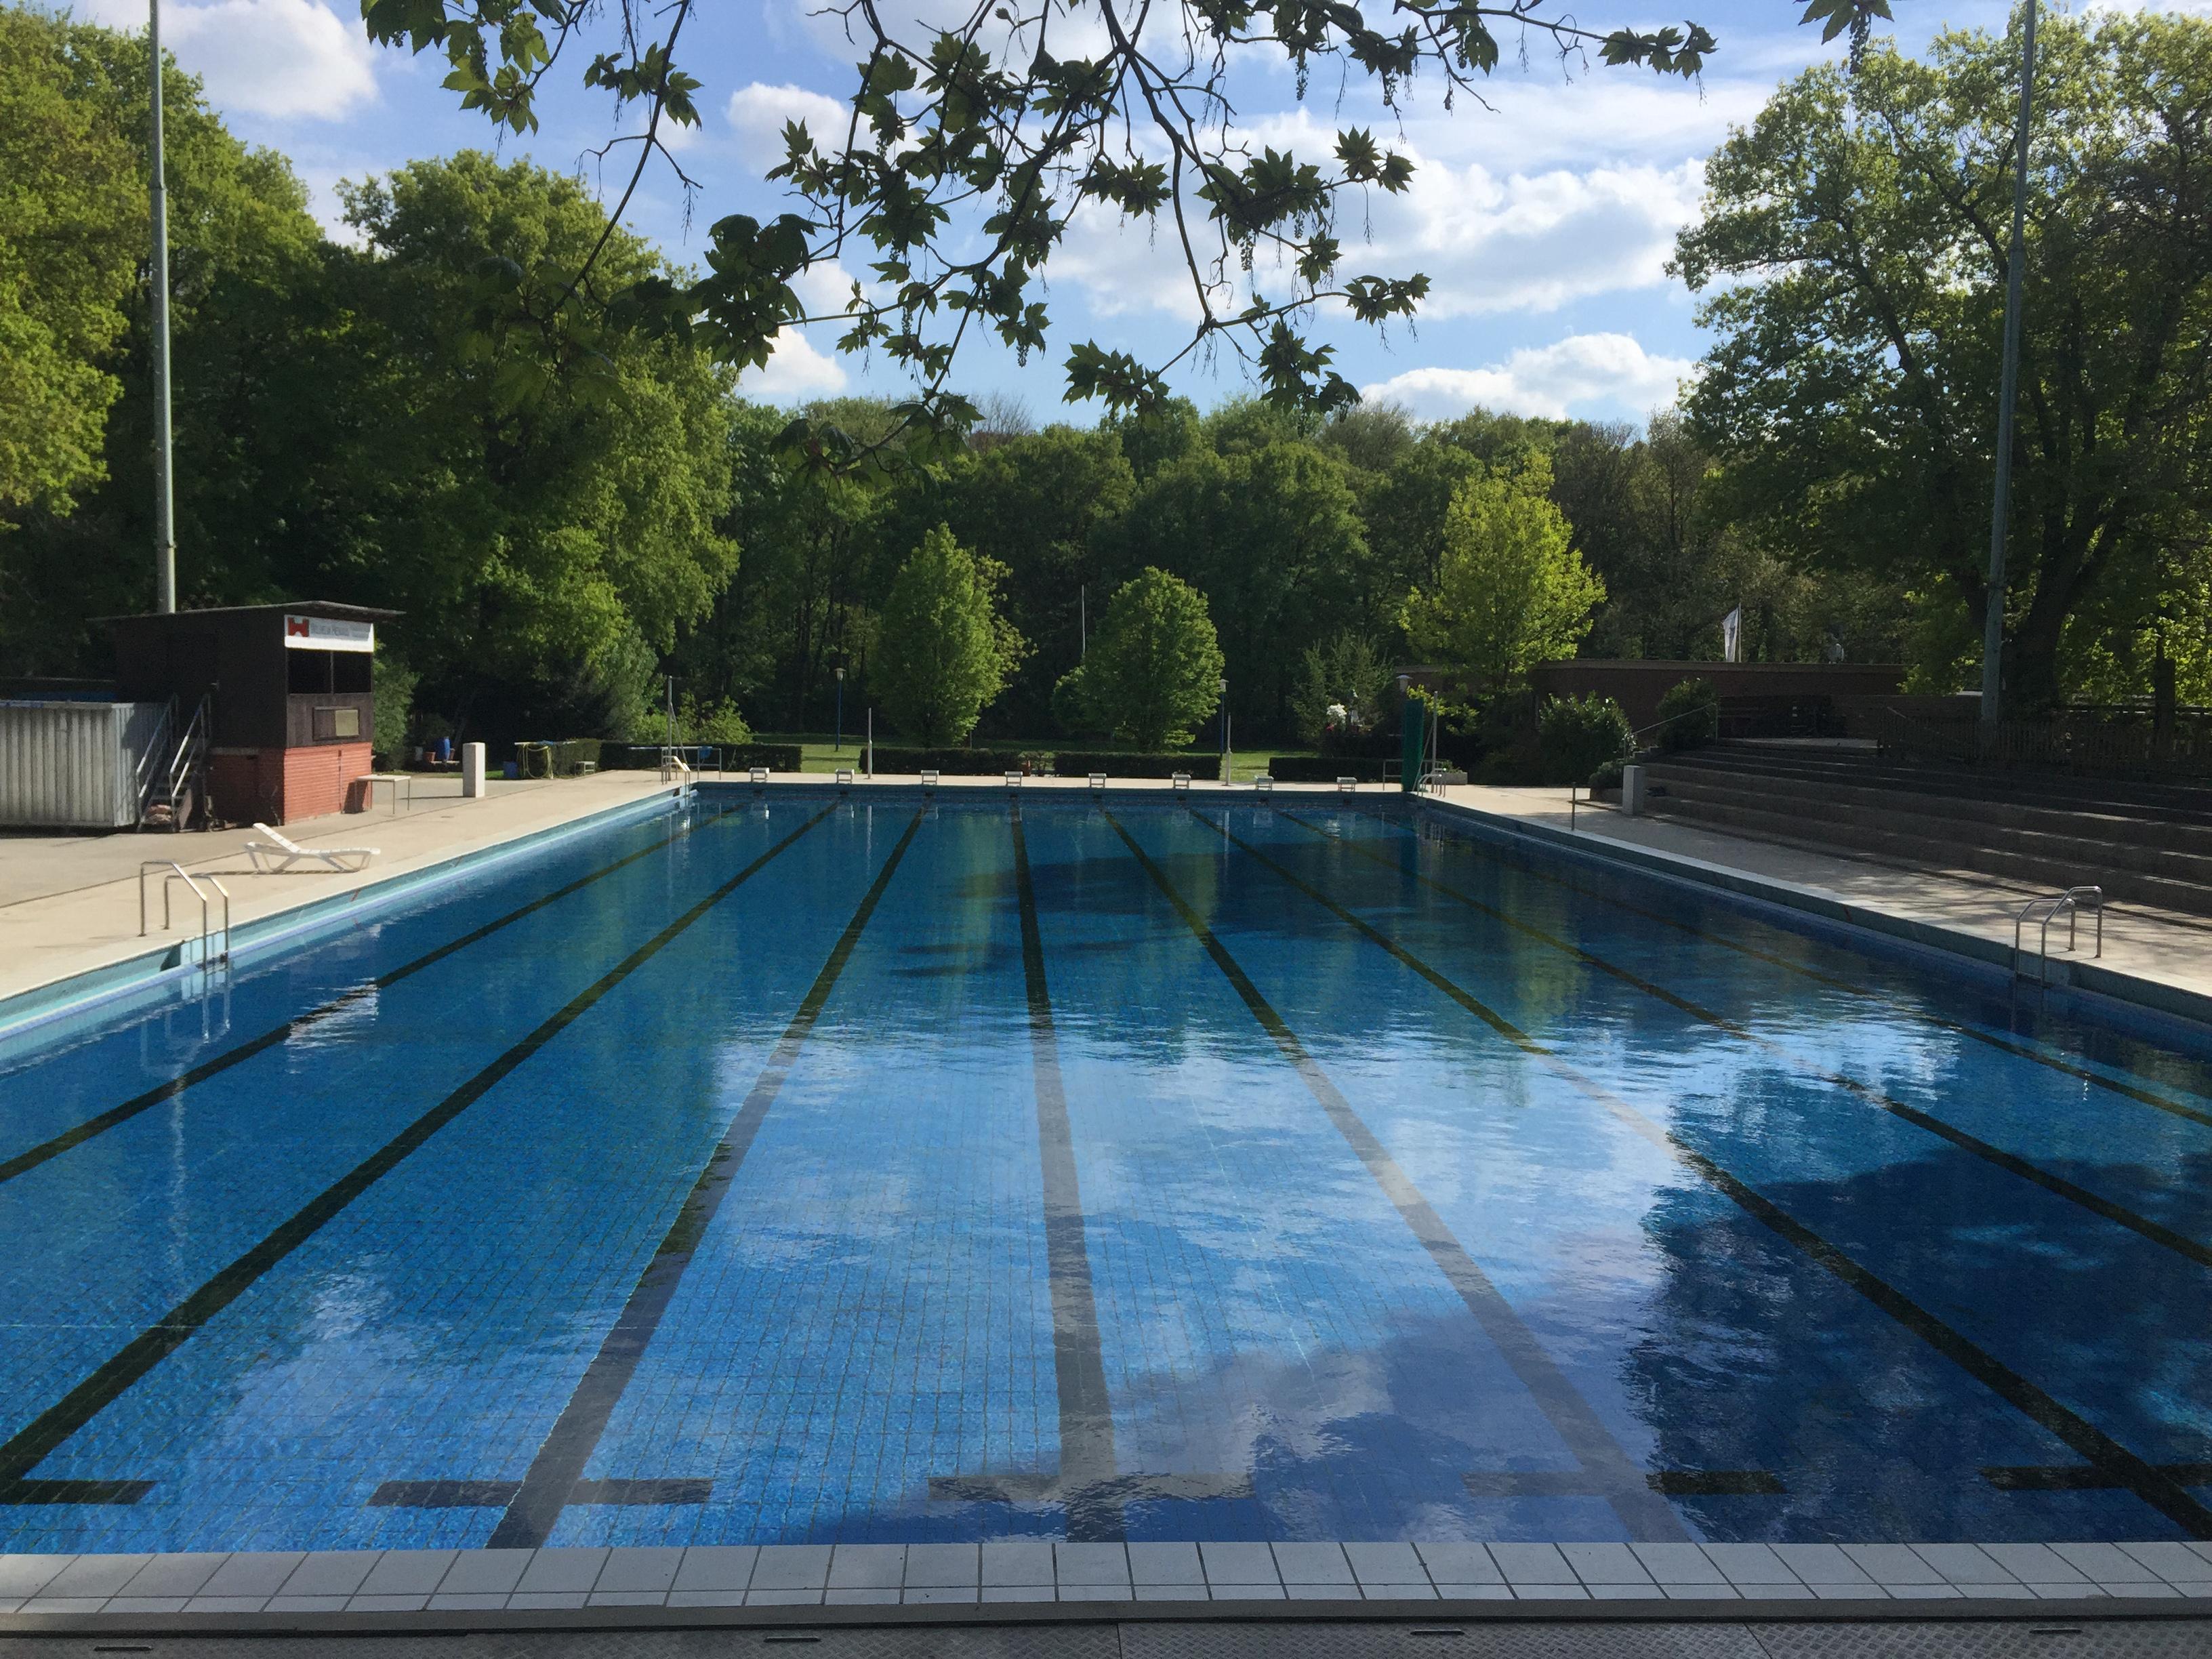 Schwimmbad-Saison 01.05.2015